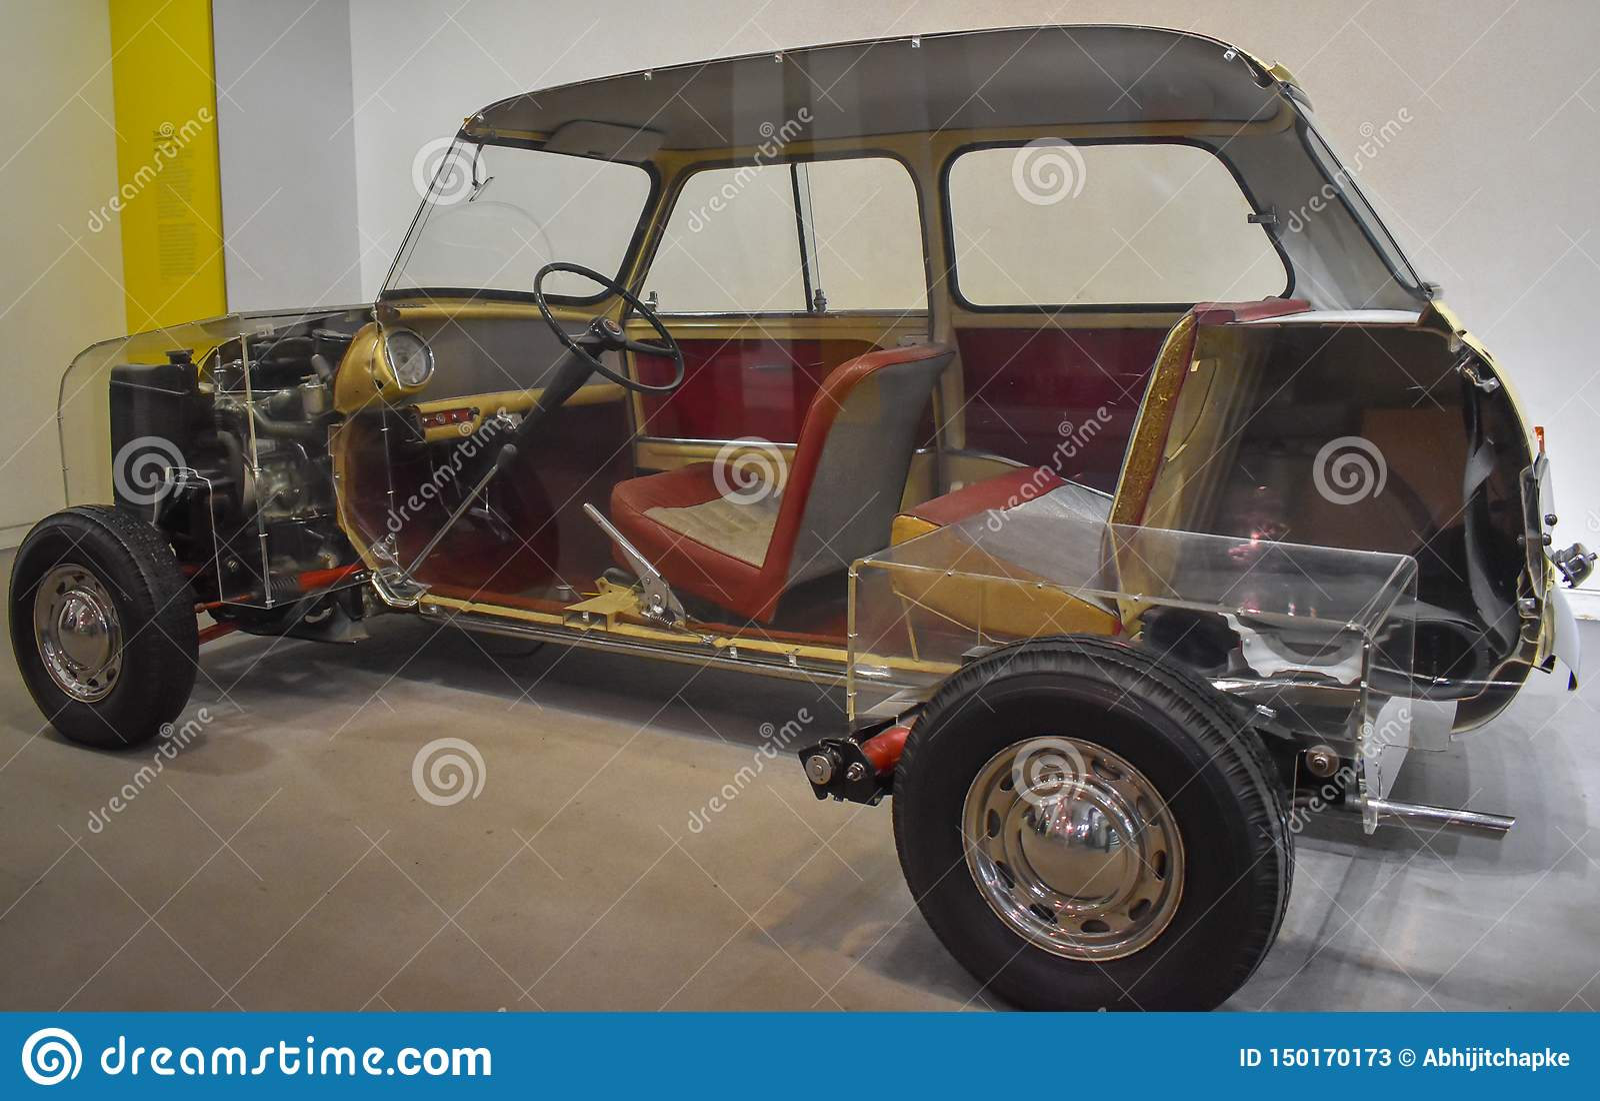 Inre delshower i halv klippt bil